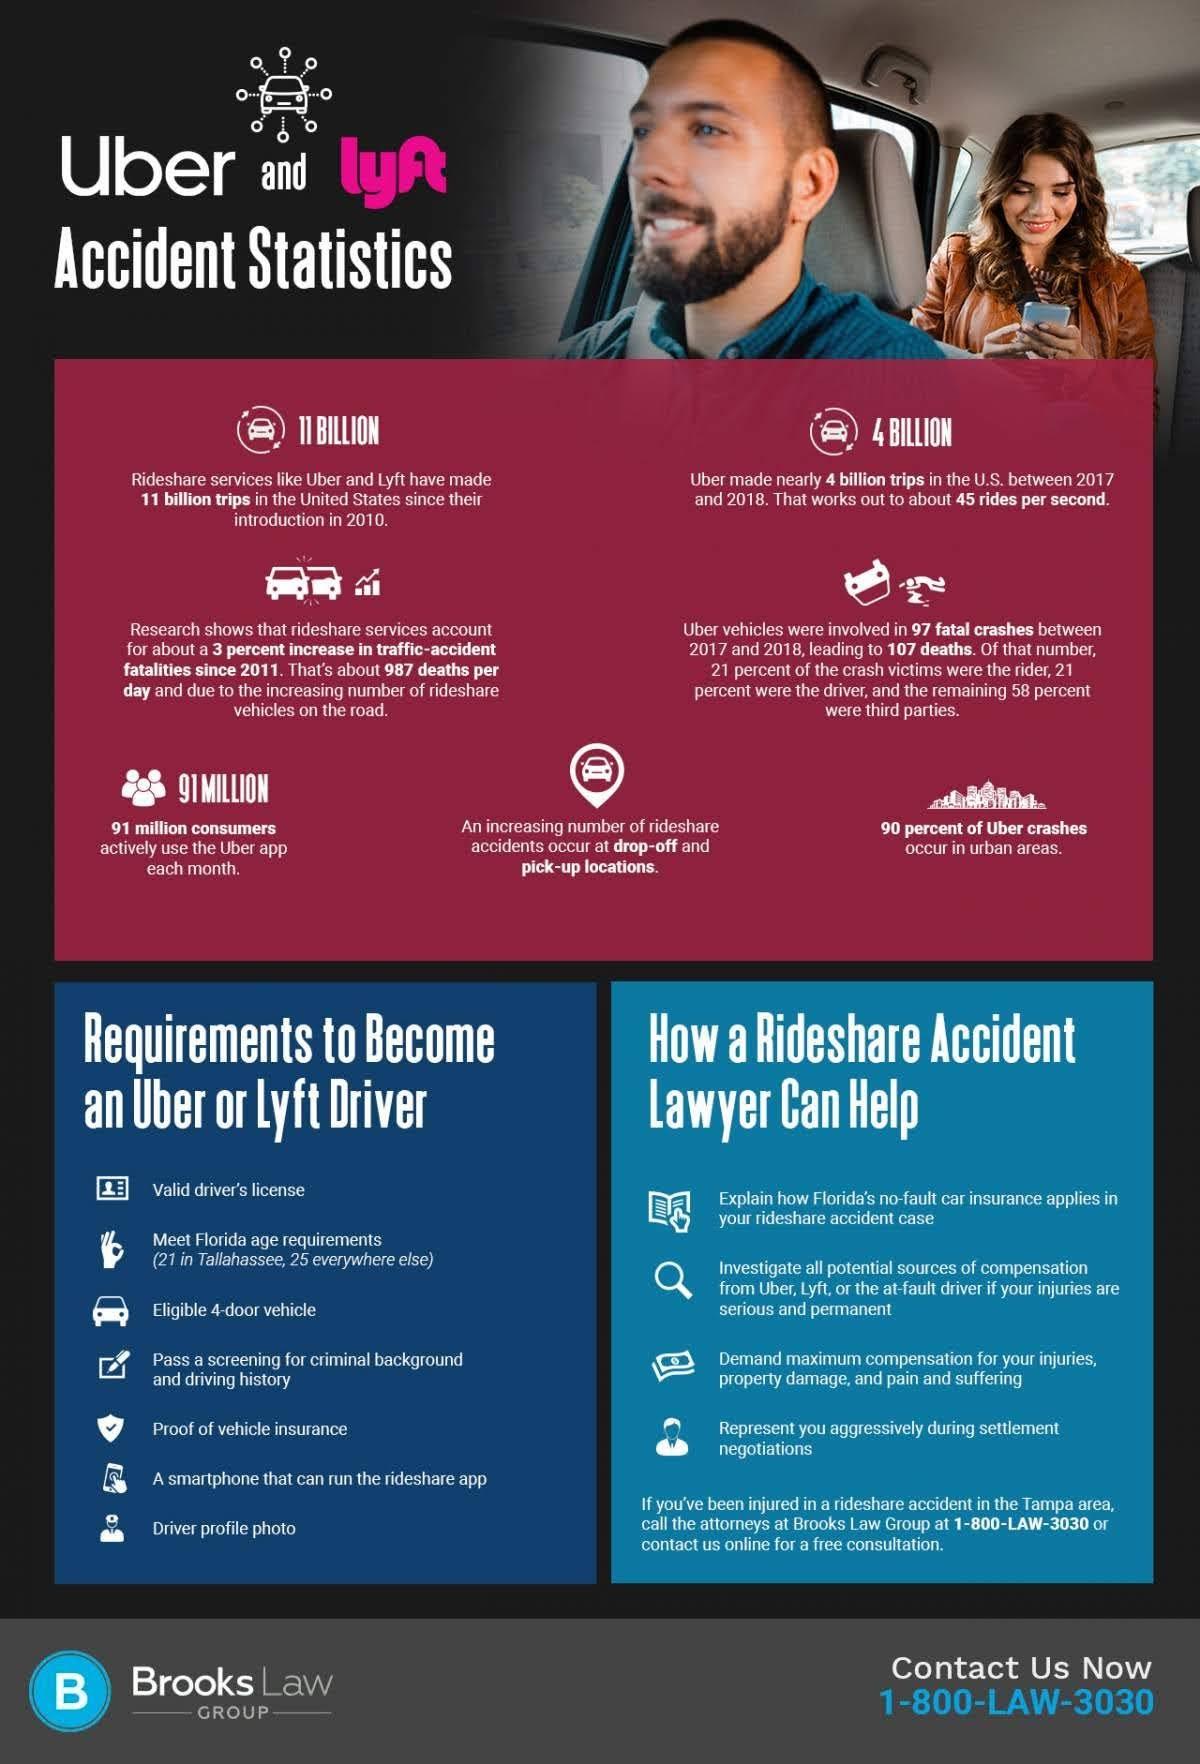 uber-and-lyft-crash-stats-infographic